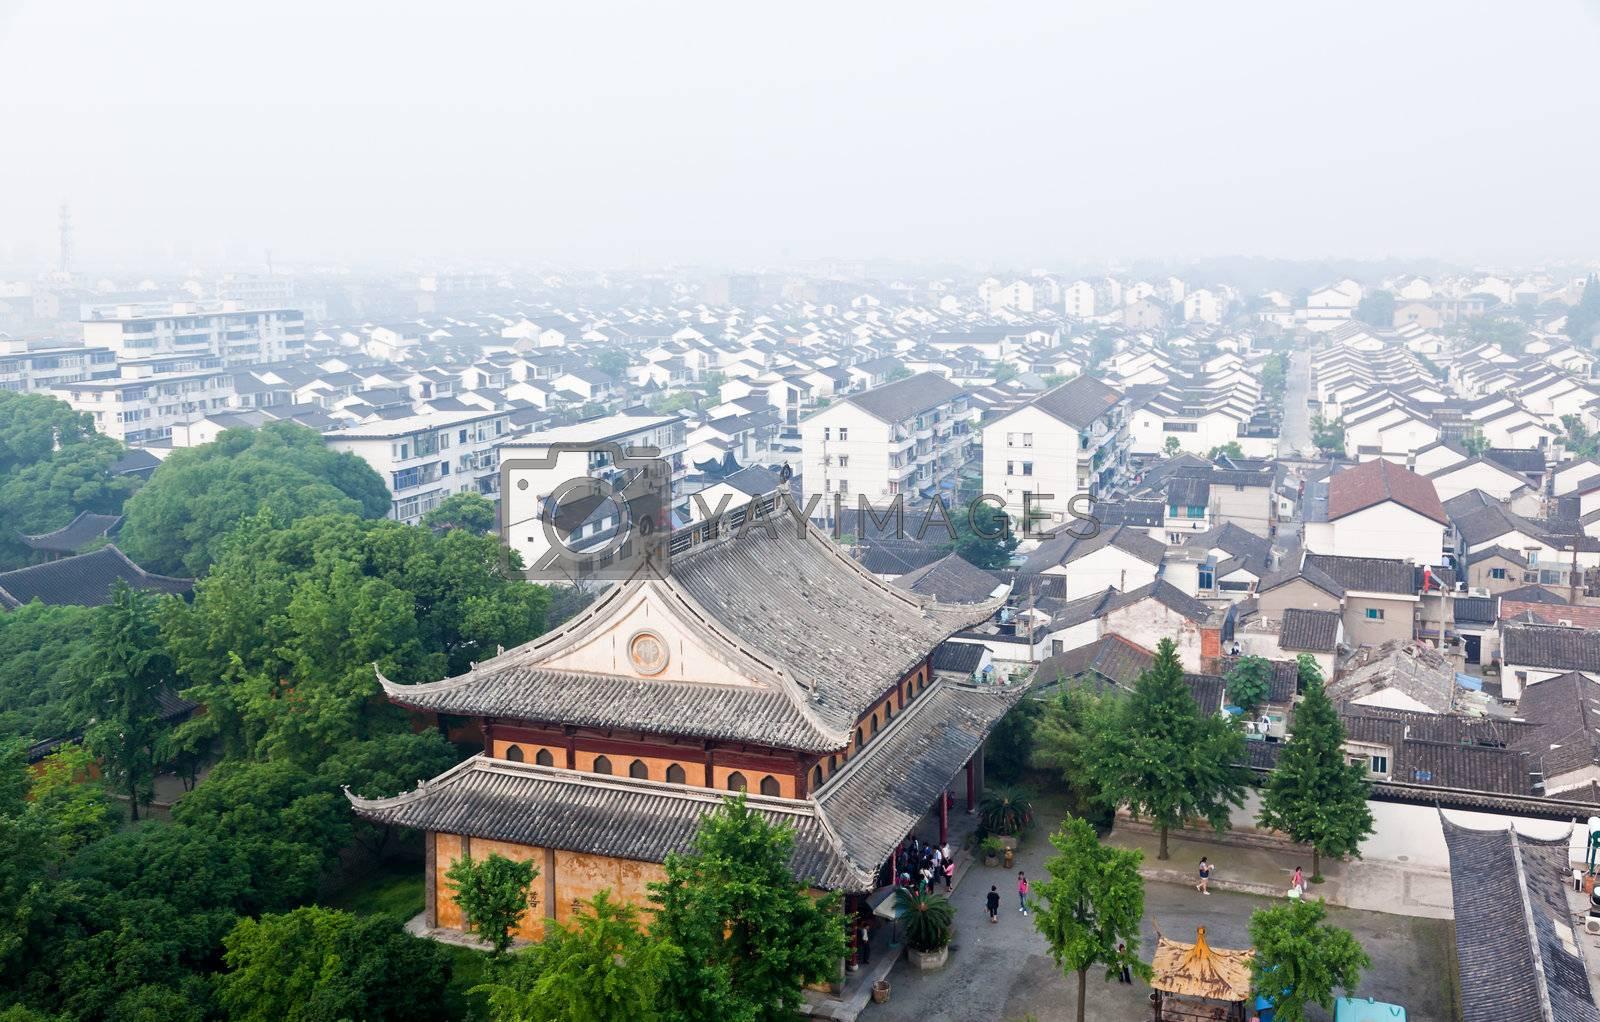 aerial view of Suzhou city from top of Basita pagoda in Suzhou China